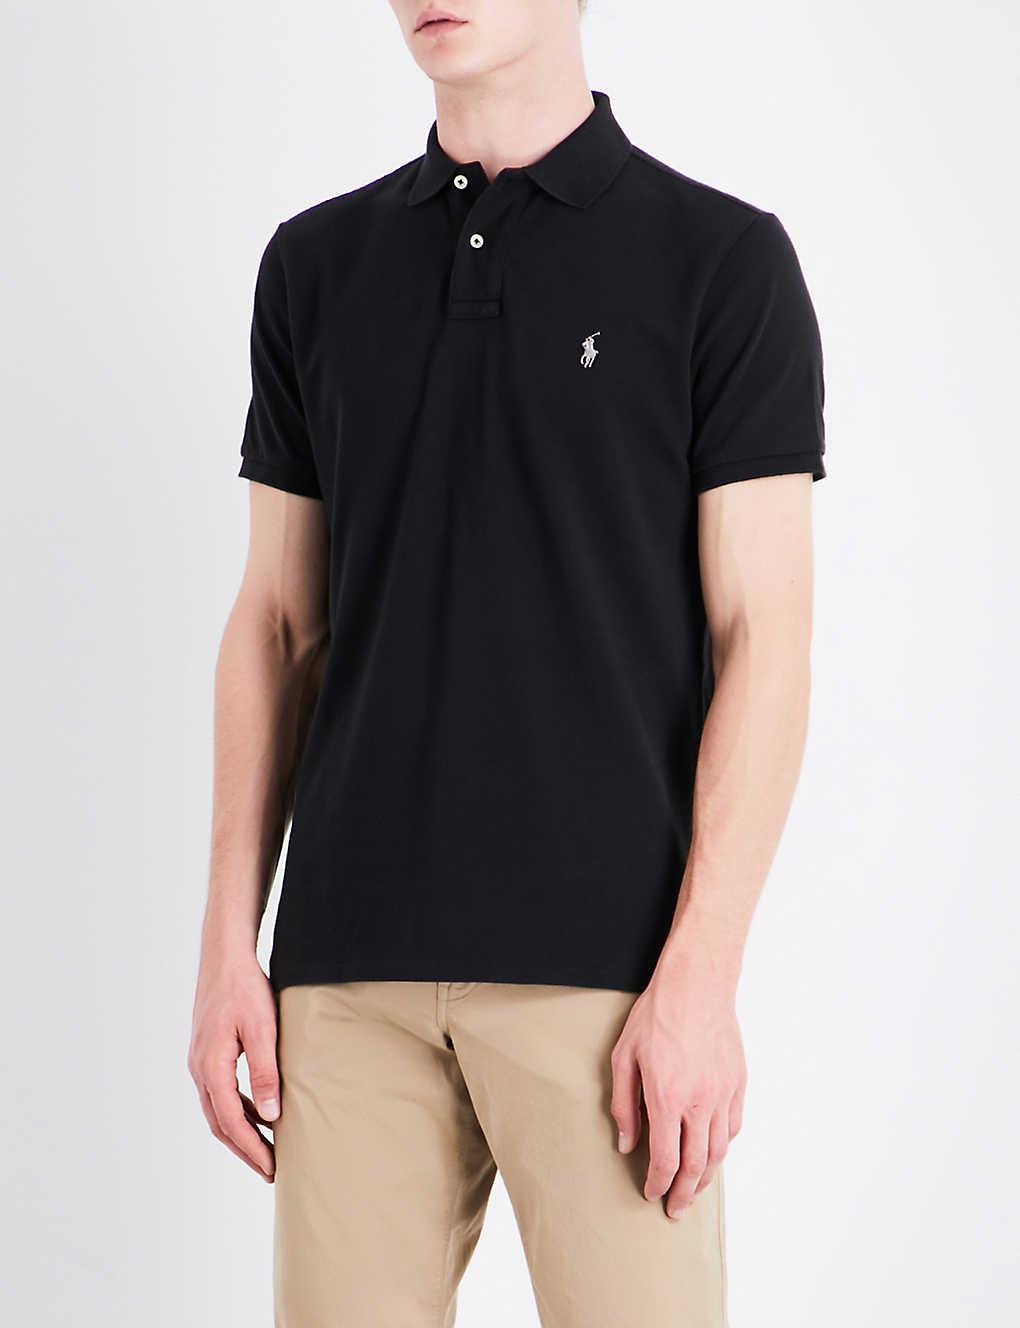 b3ad98c9 POLO RALPH LAUREN - Custom-fit cotton-pique polo shirt   Selfridges.com